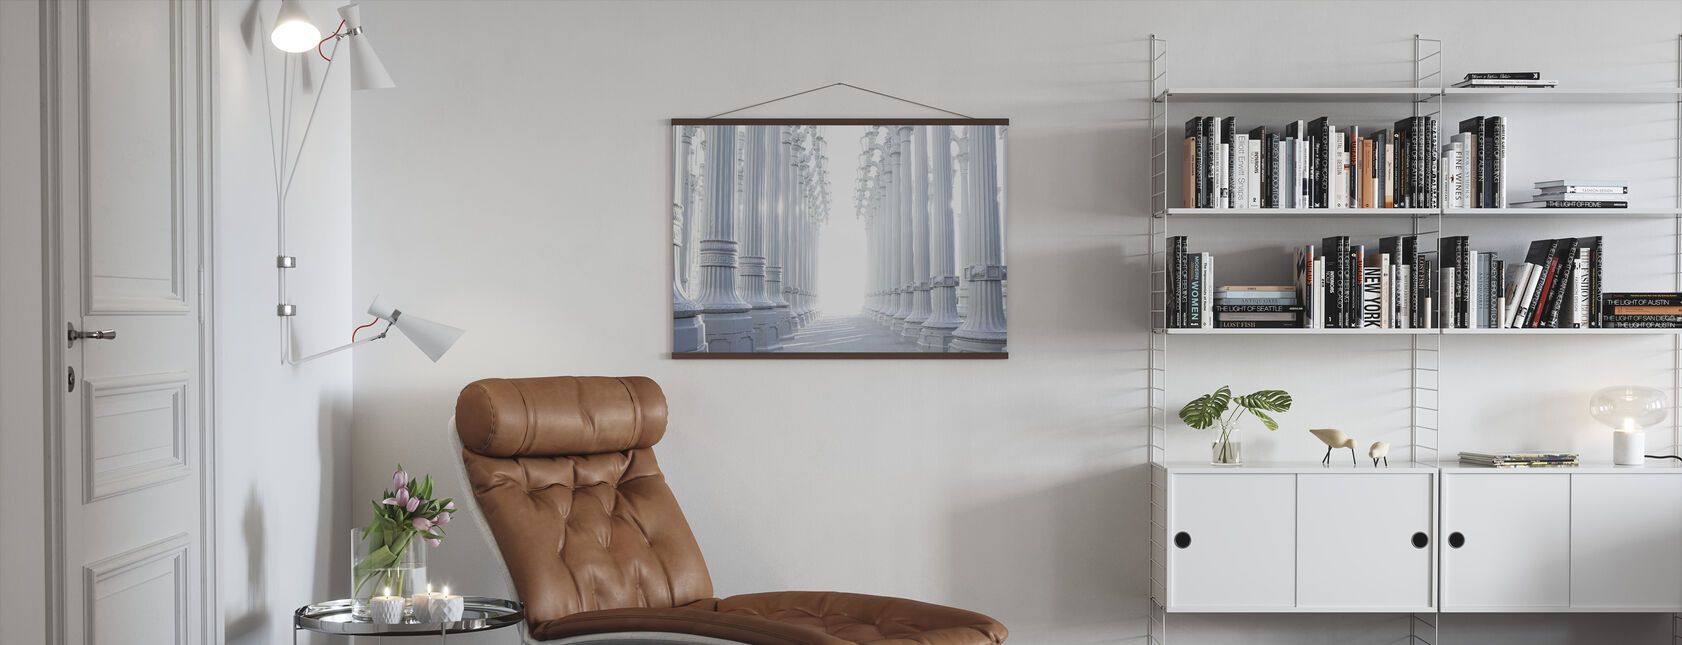 Ancient Hallway Columns - Poster - Living Room